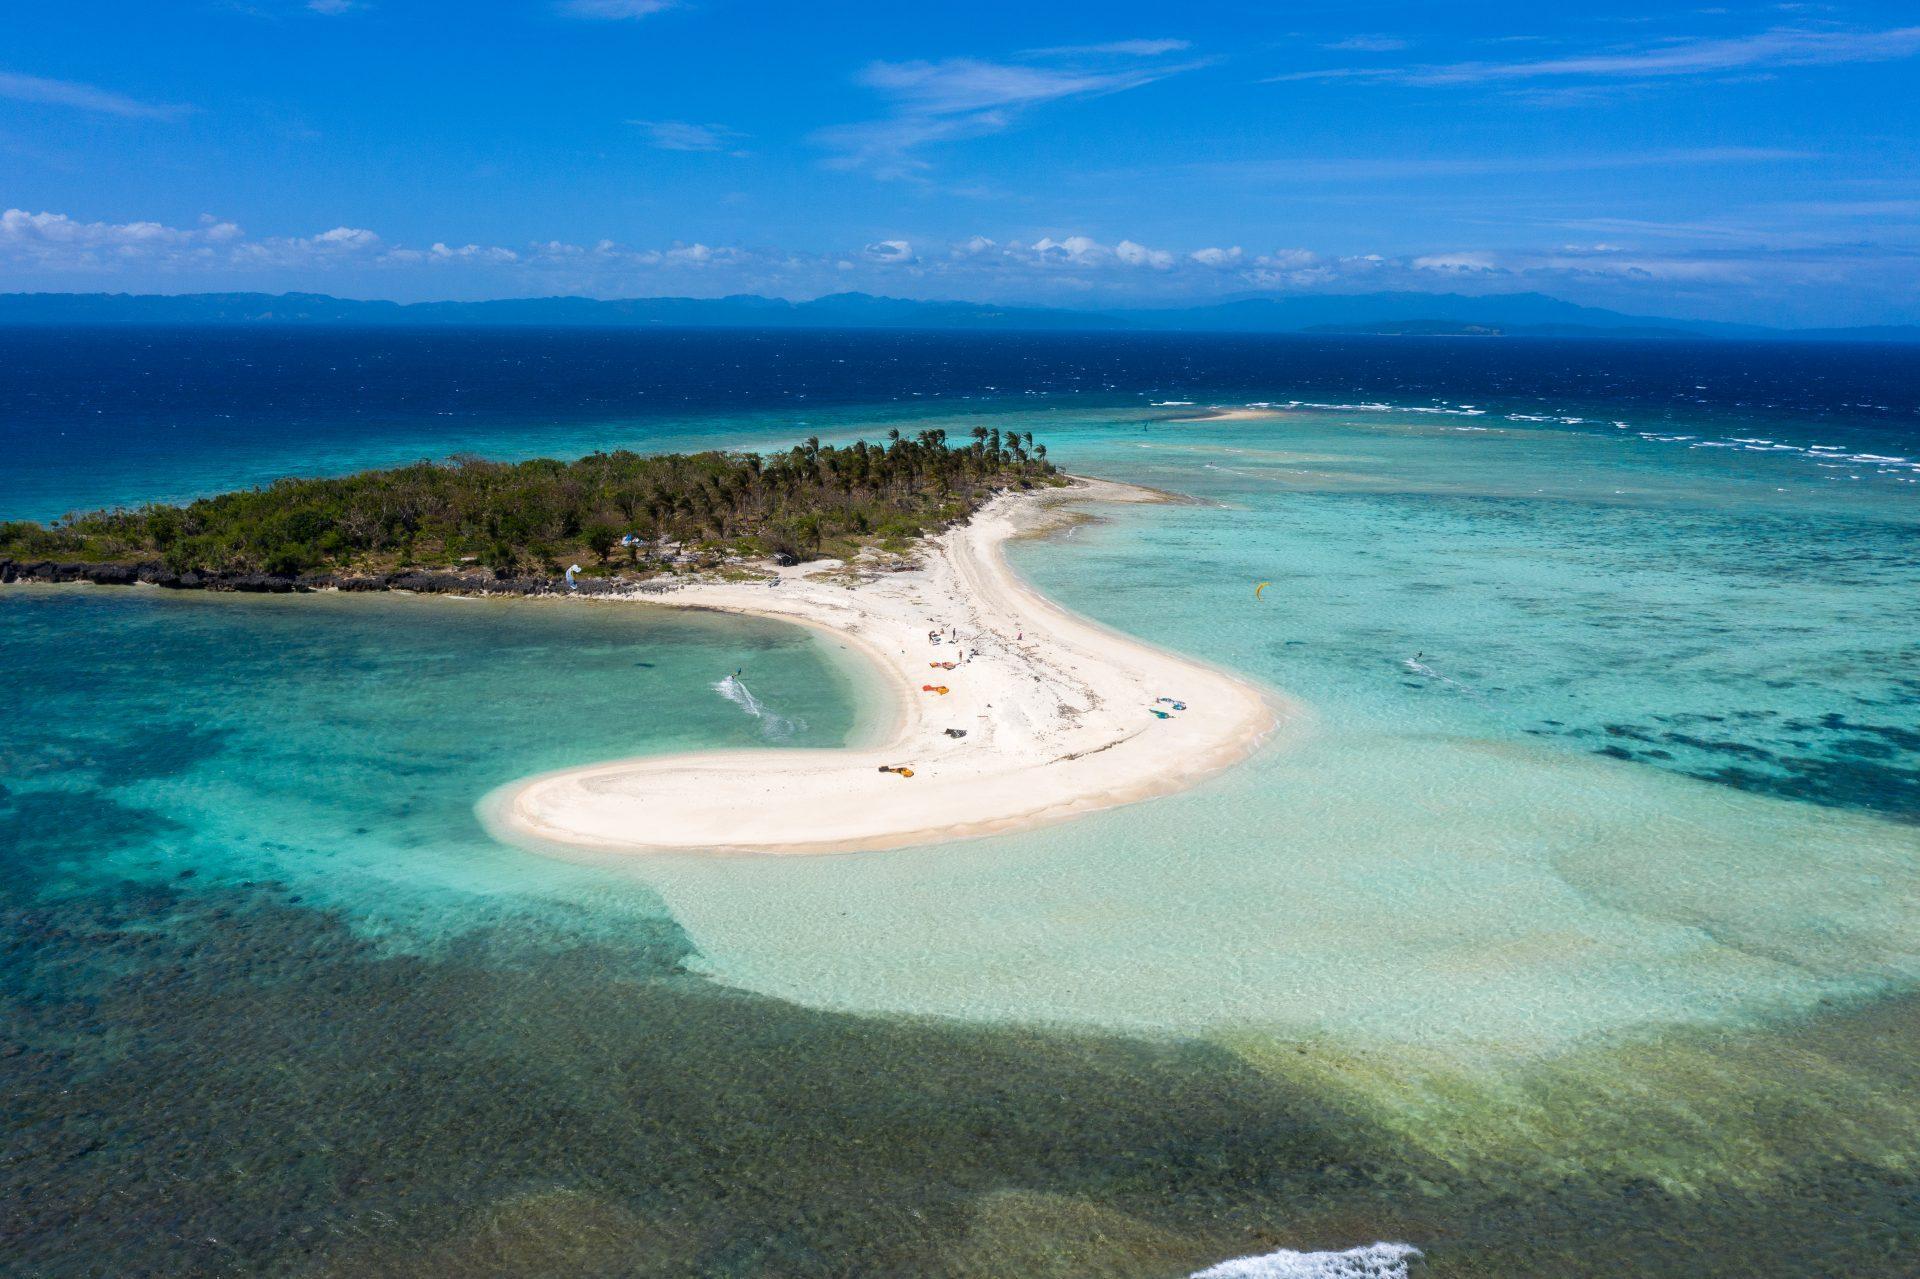 Kite safari filipini - island hopping